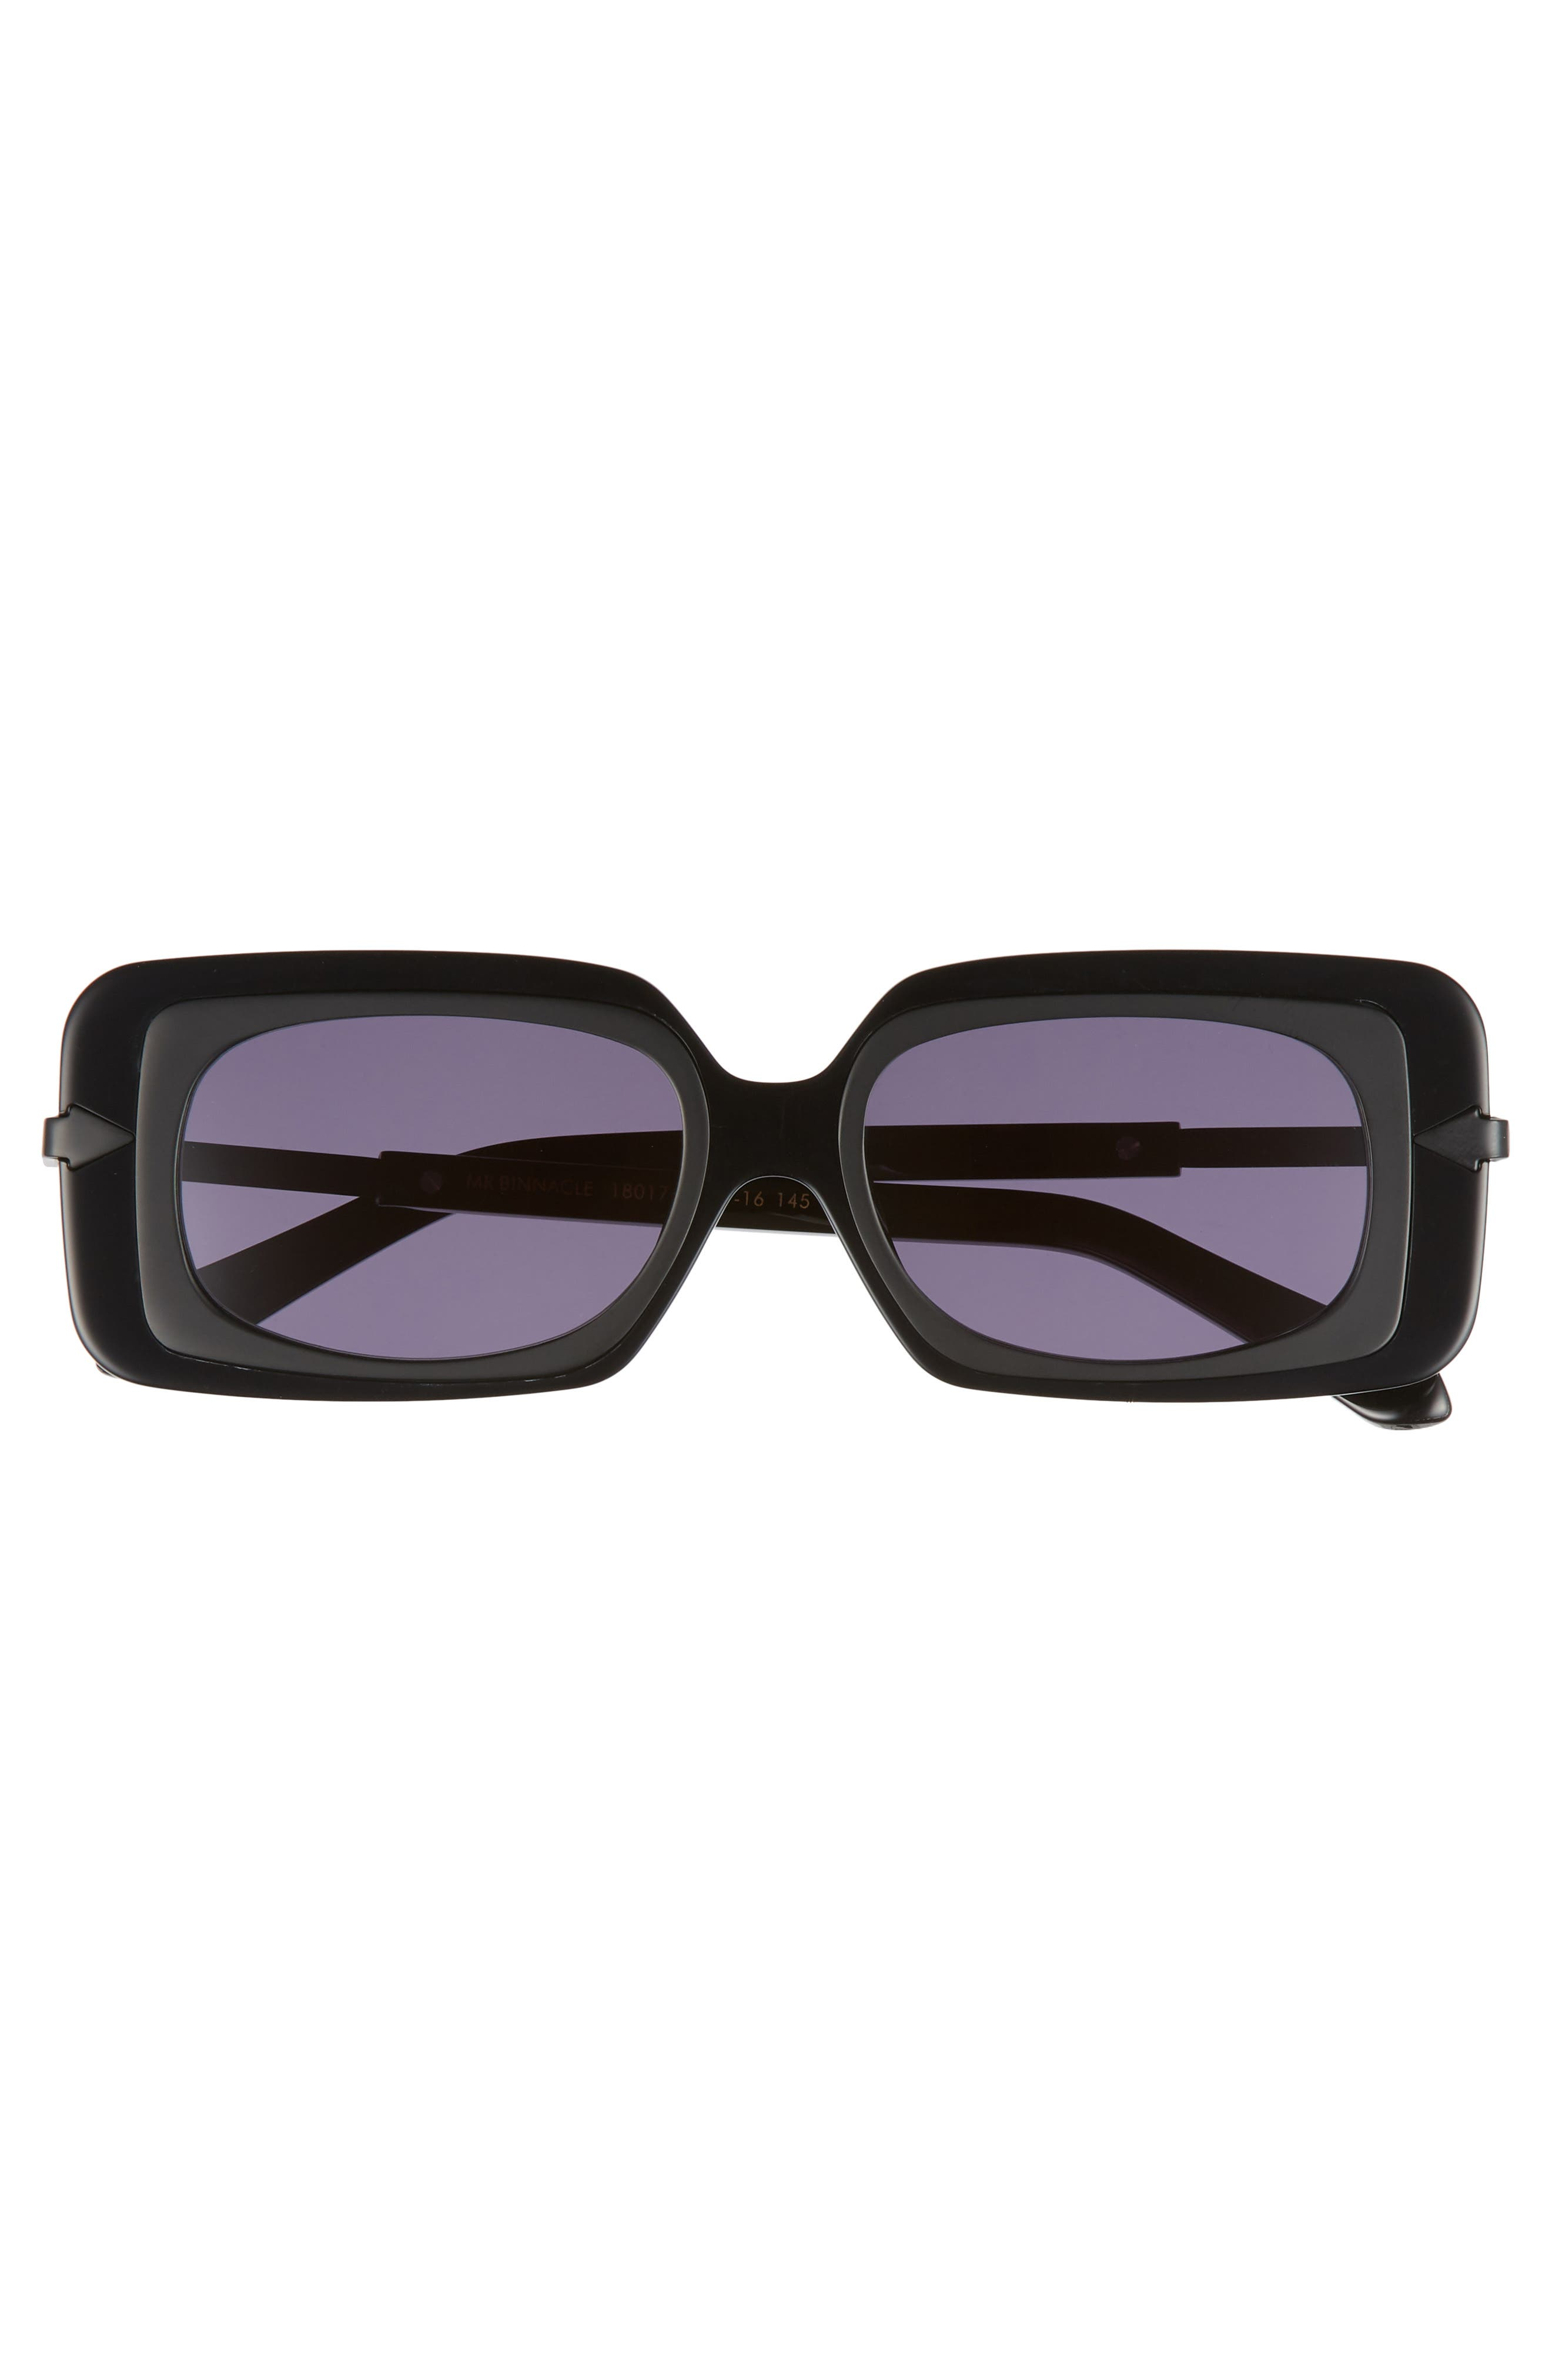 Mr. Binnacle 51mm Sunglasses,                             Alternate thumbnail 3, color,                             Black